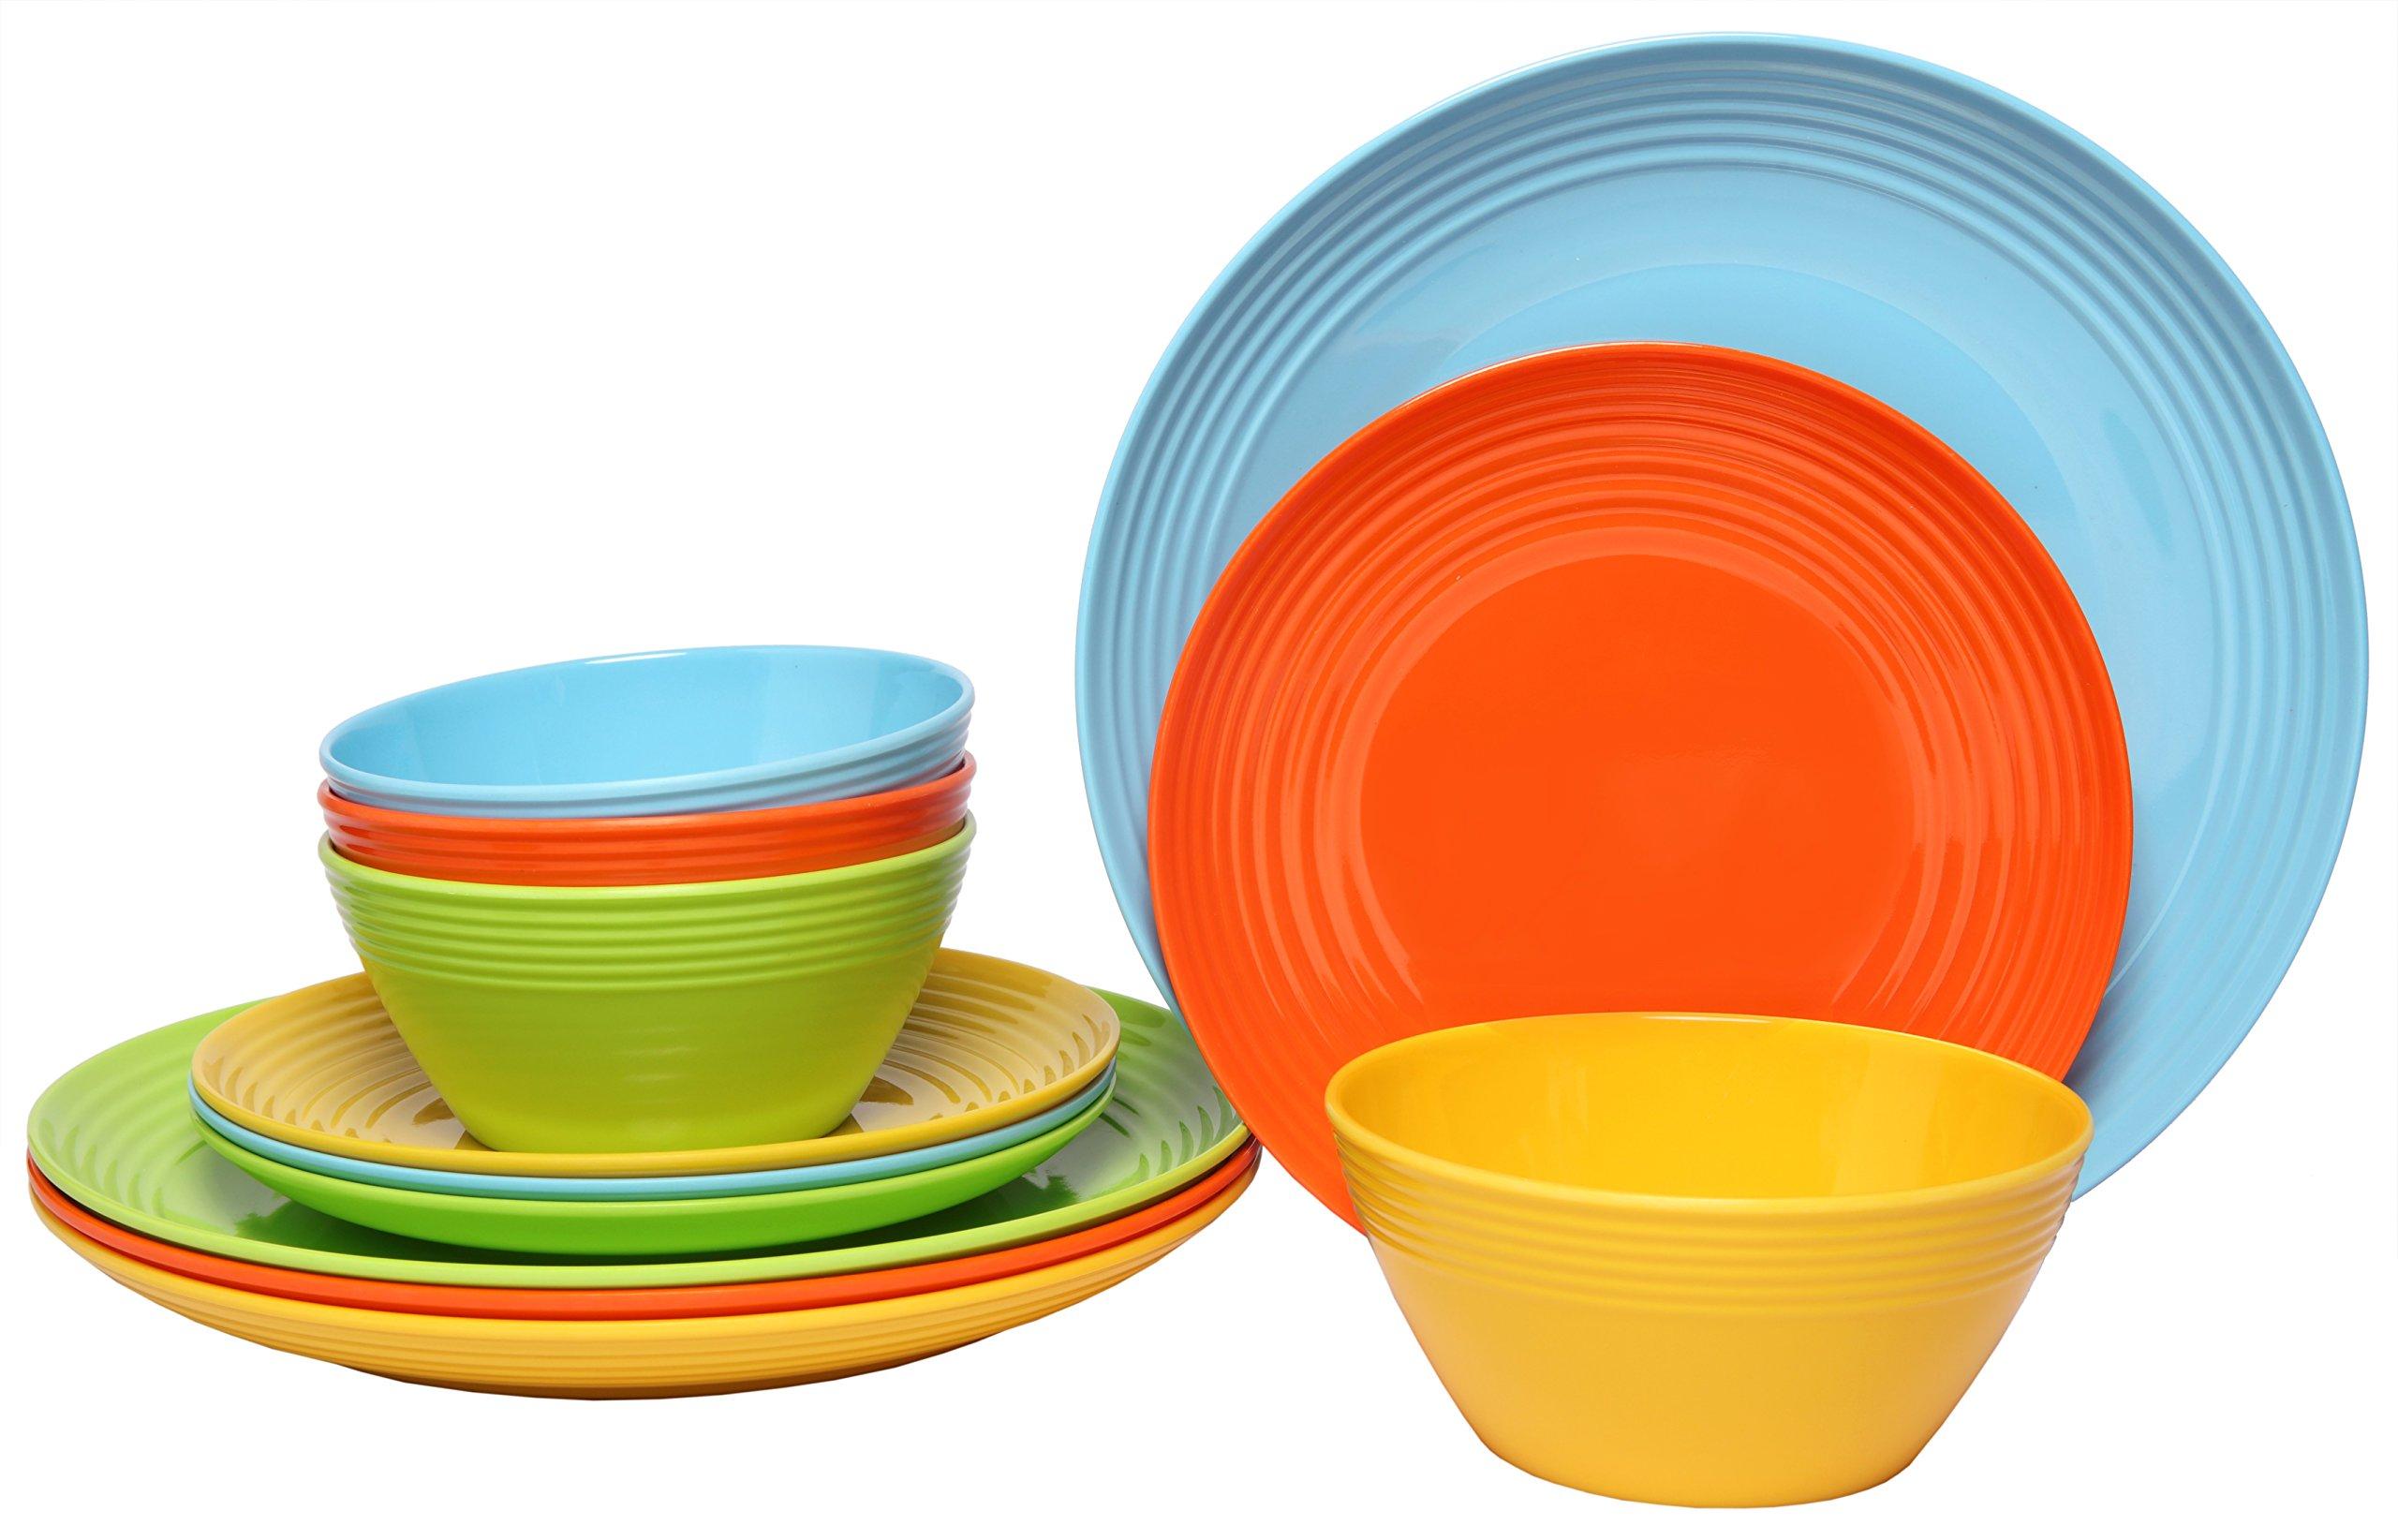 Melange Dinnerware Collection Shatter Proof Chip Resistant